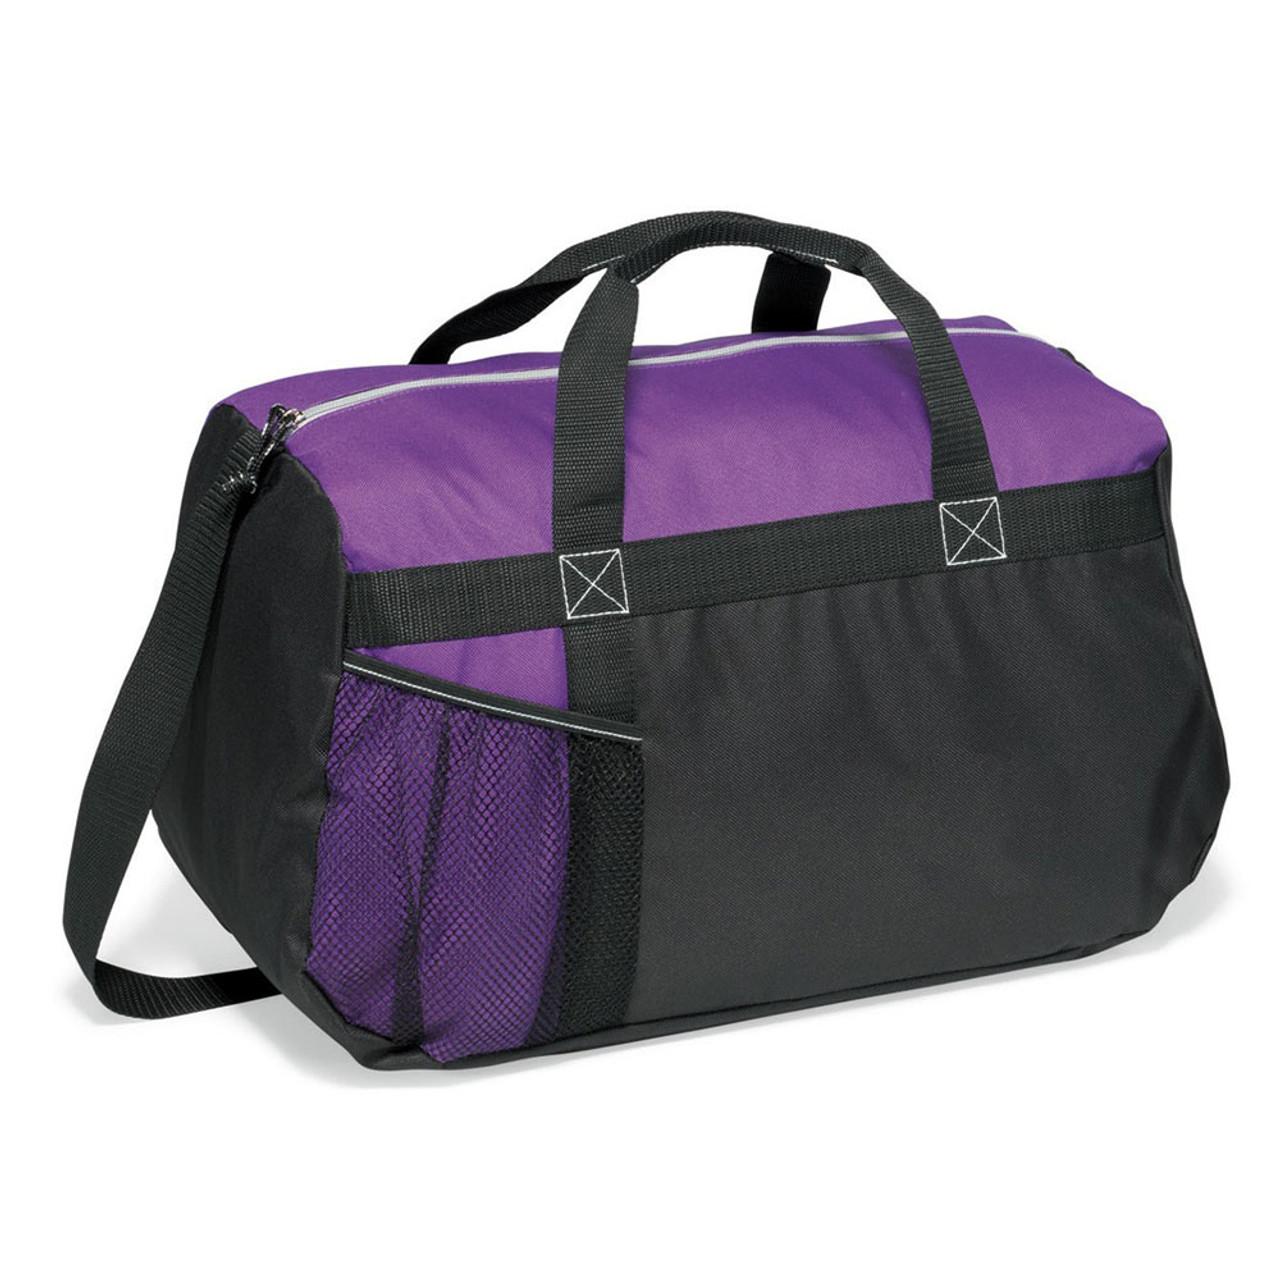 293e927315c8 bulk buy duffle bags australia